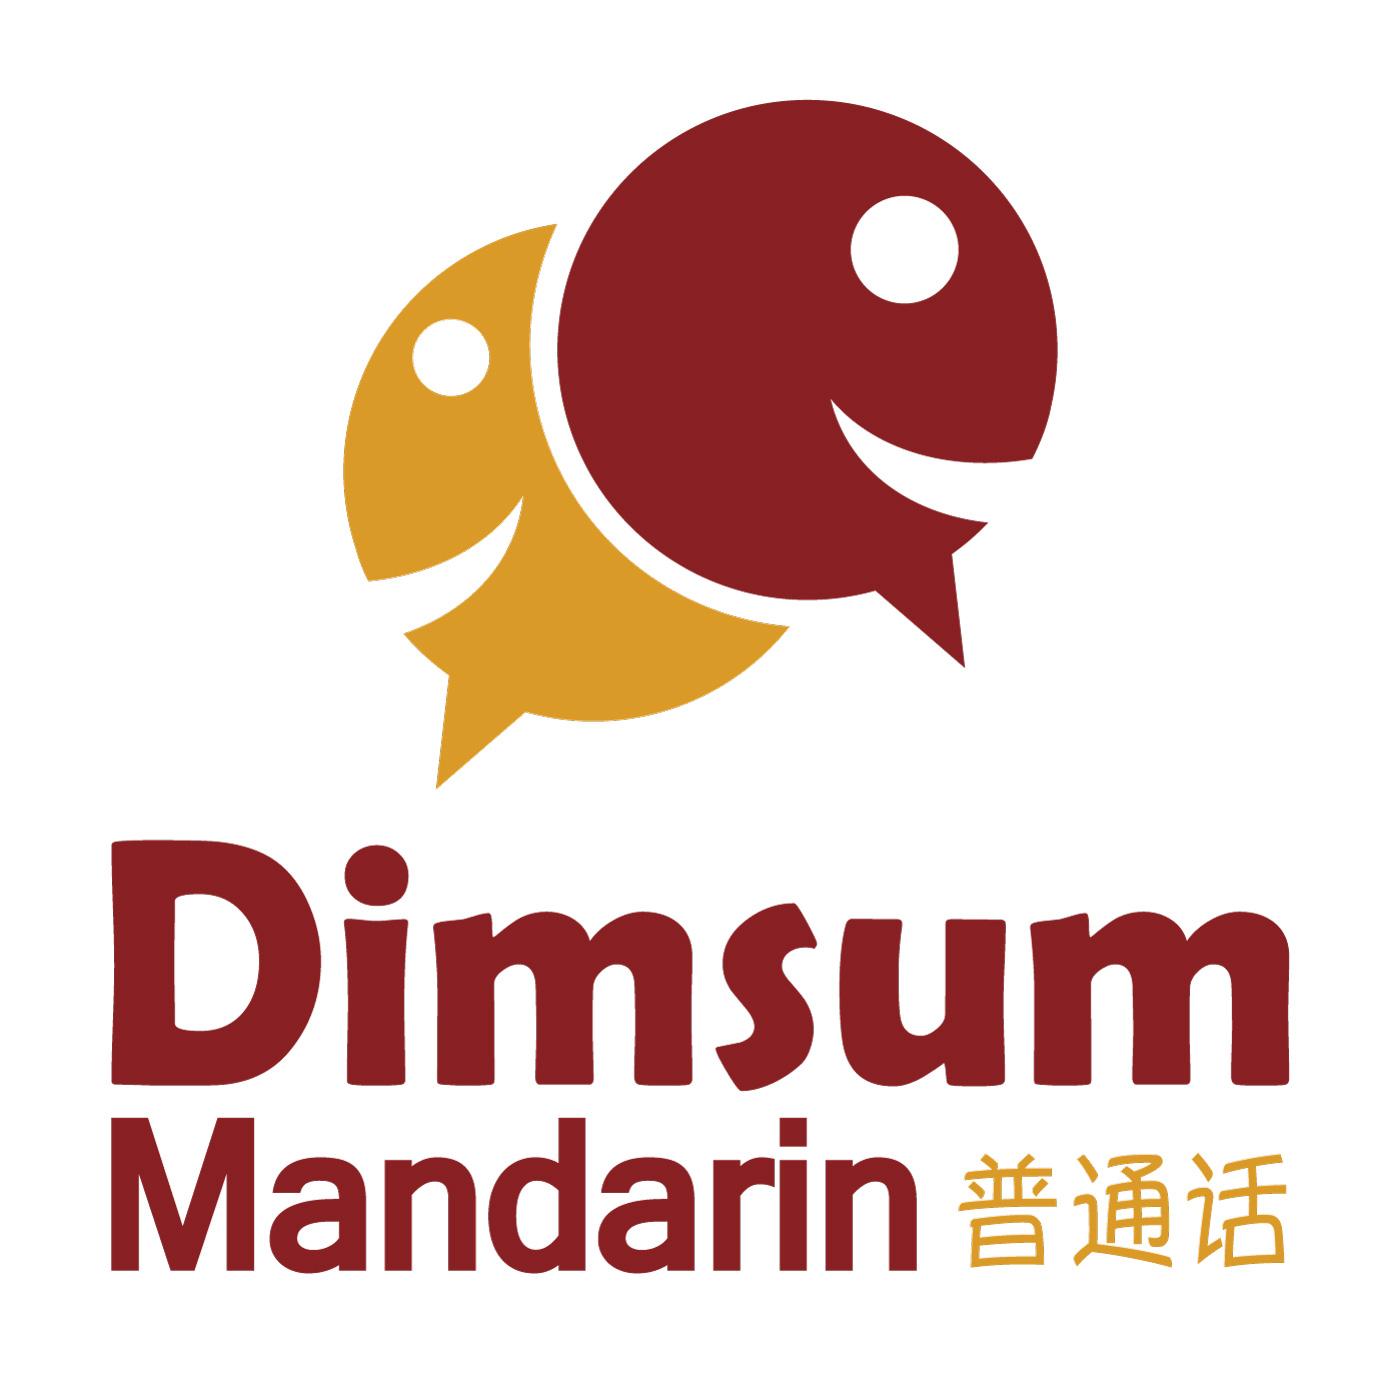 Dimsum Mandarin - Learn Mandarin Chinese